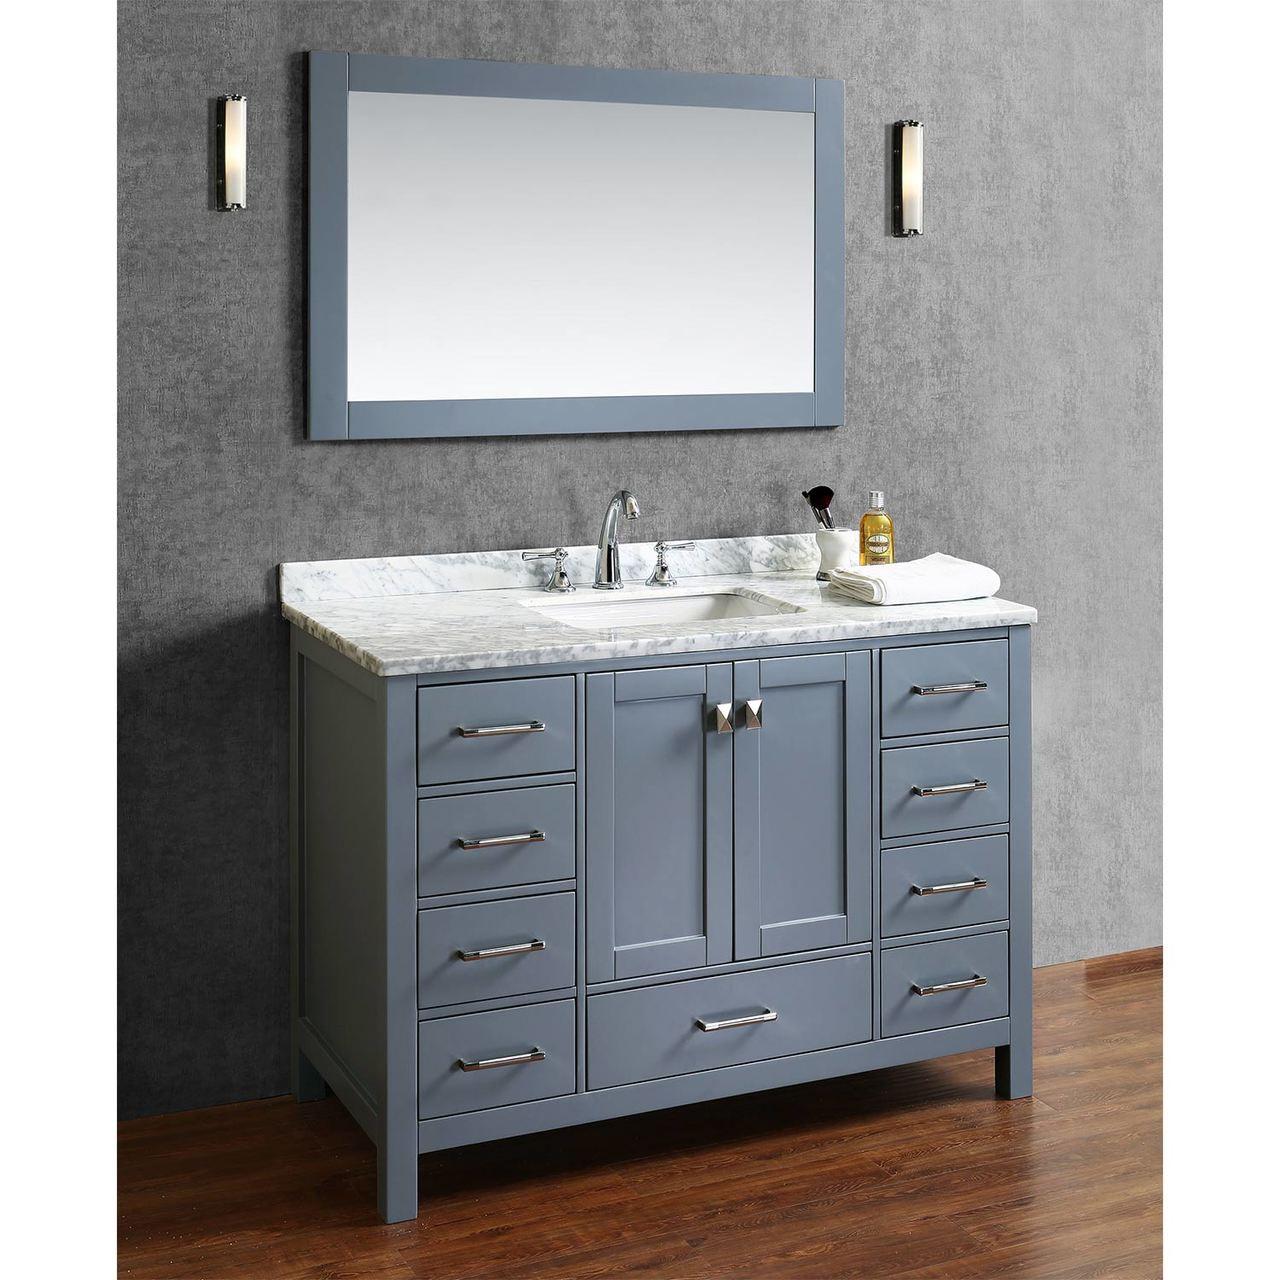 Armada 48 Bathroom Vanity Ice Grey York Taps